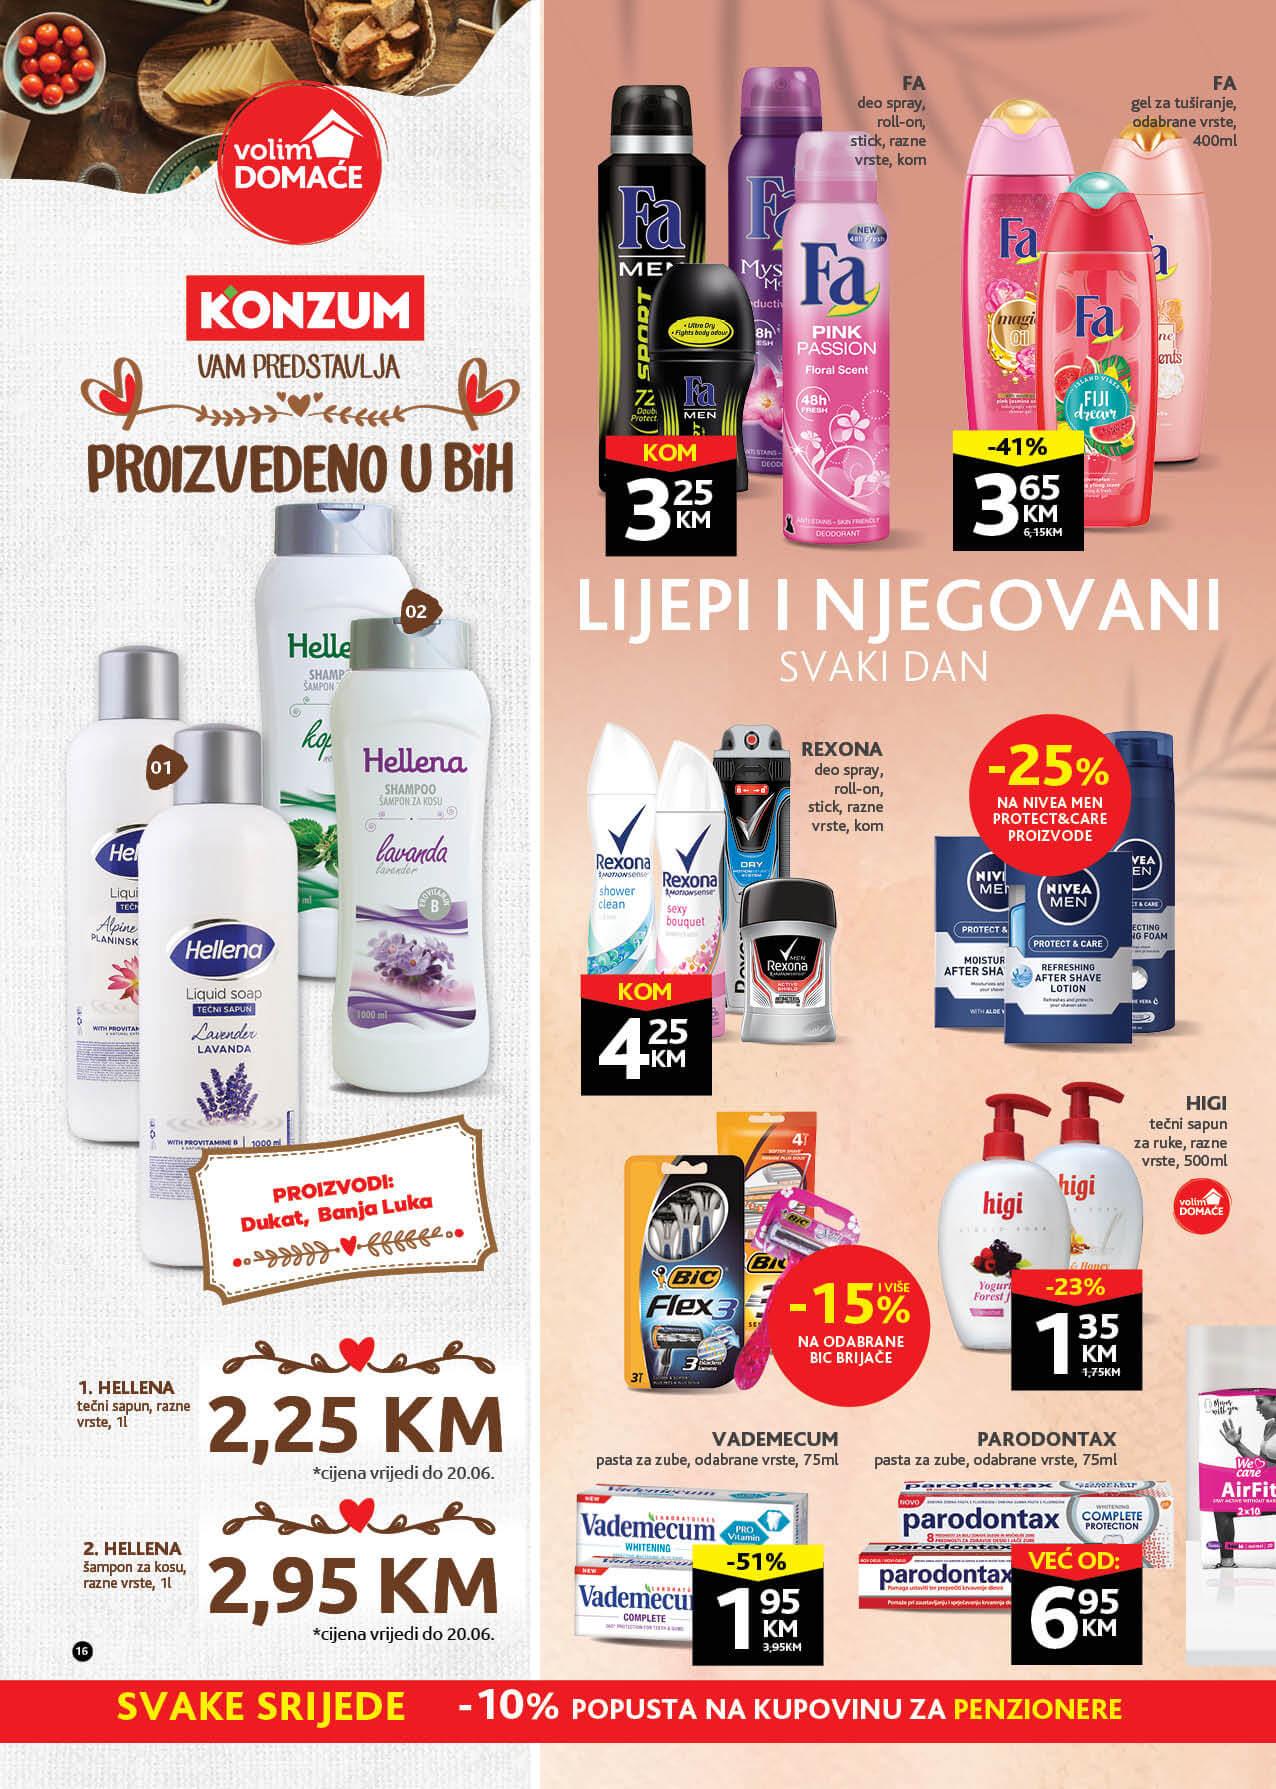 KONZUM Katalog Redovni katalog JUN 2021 07.06. 17.06. eKatalozi.com PR Page 16